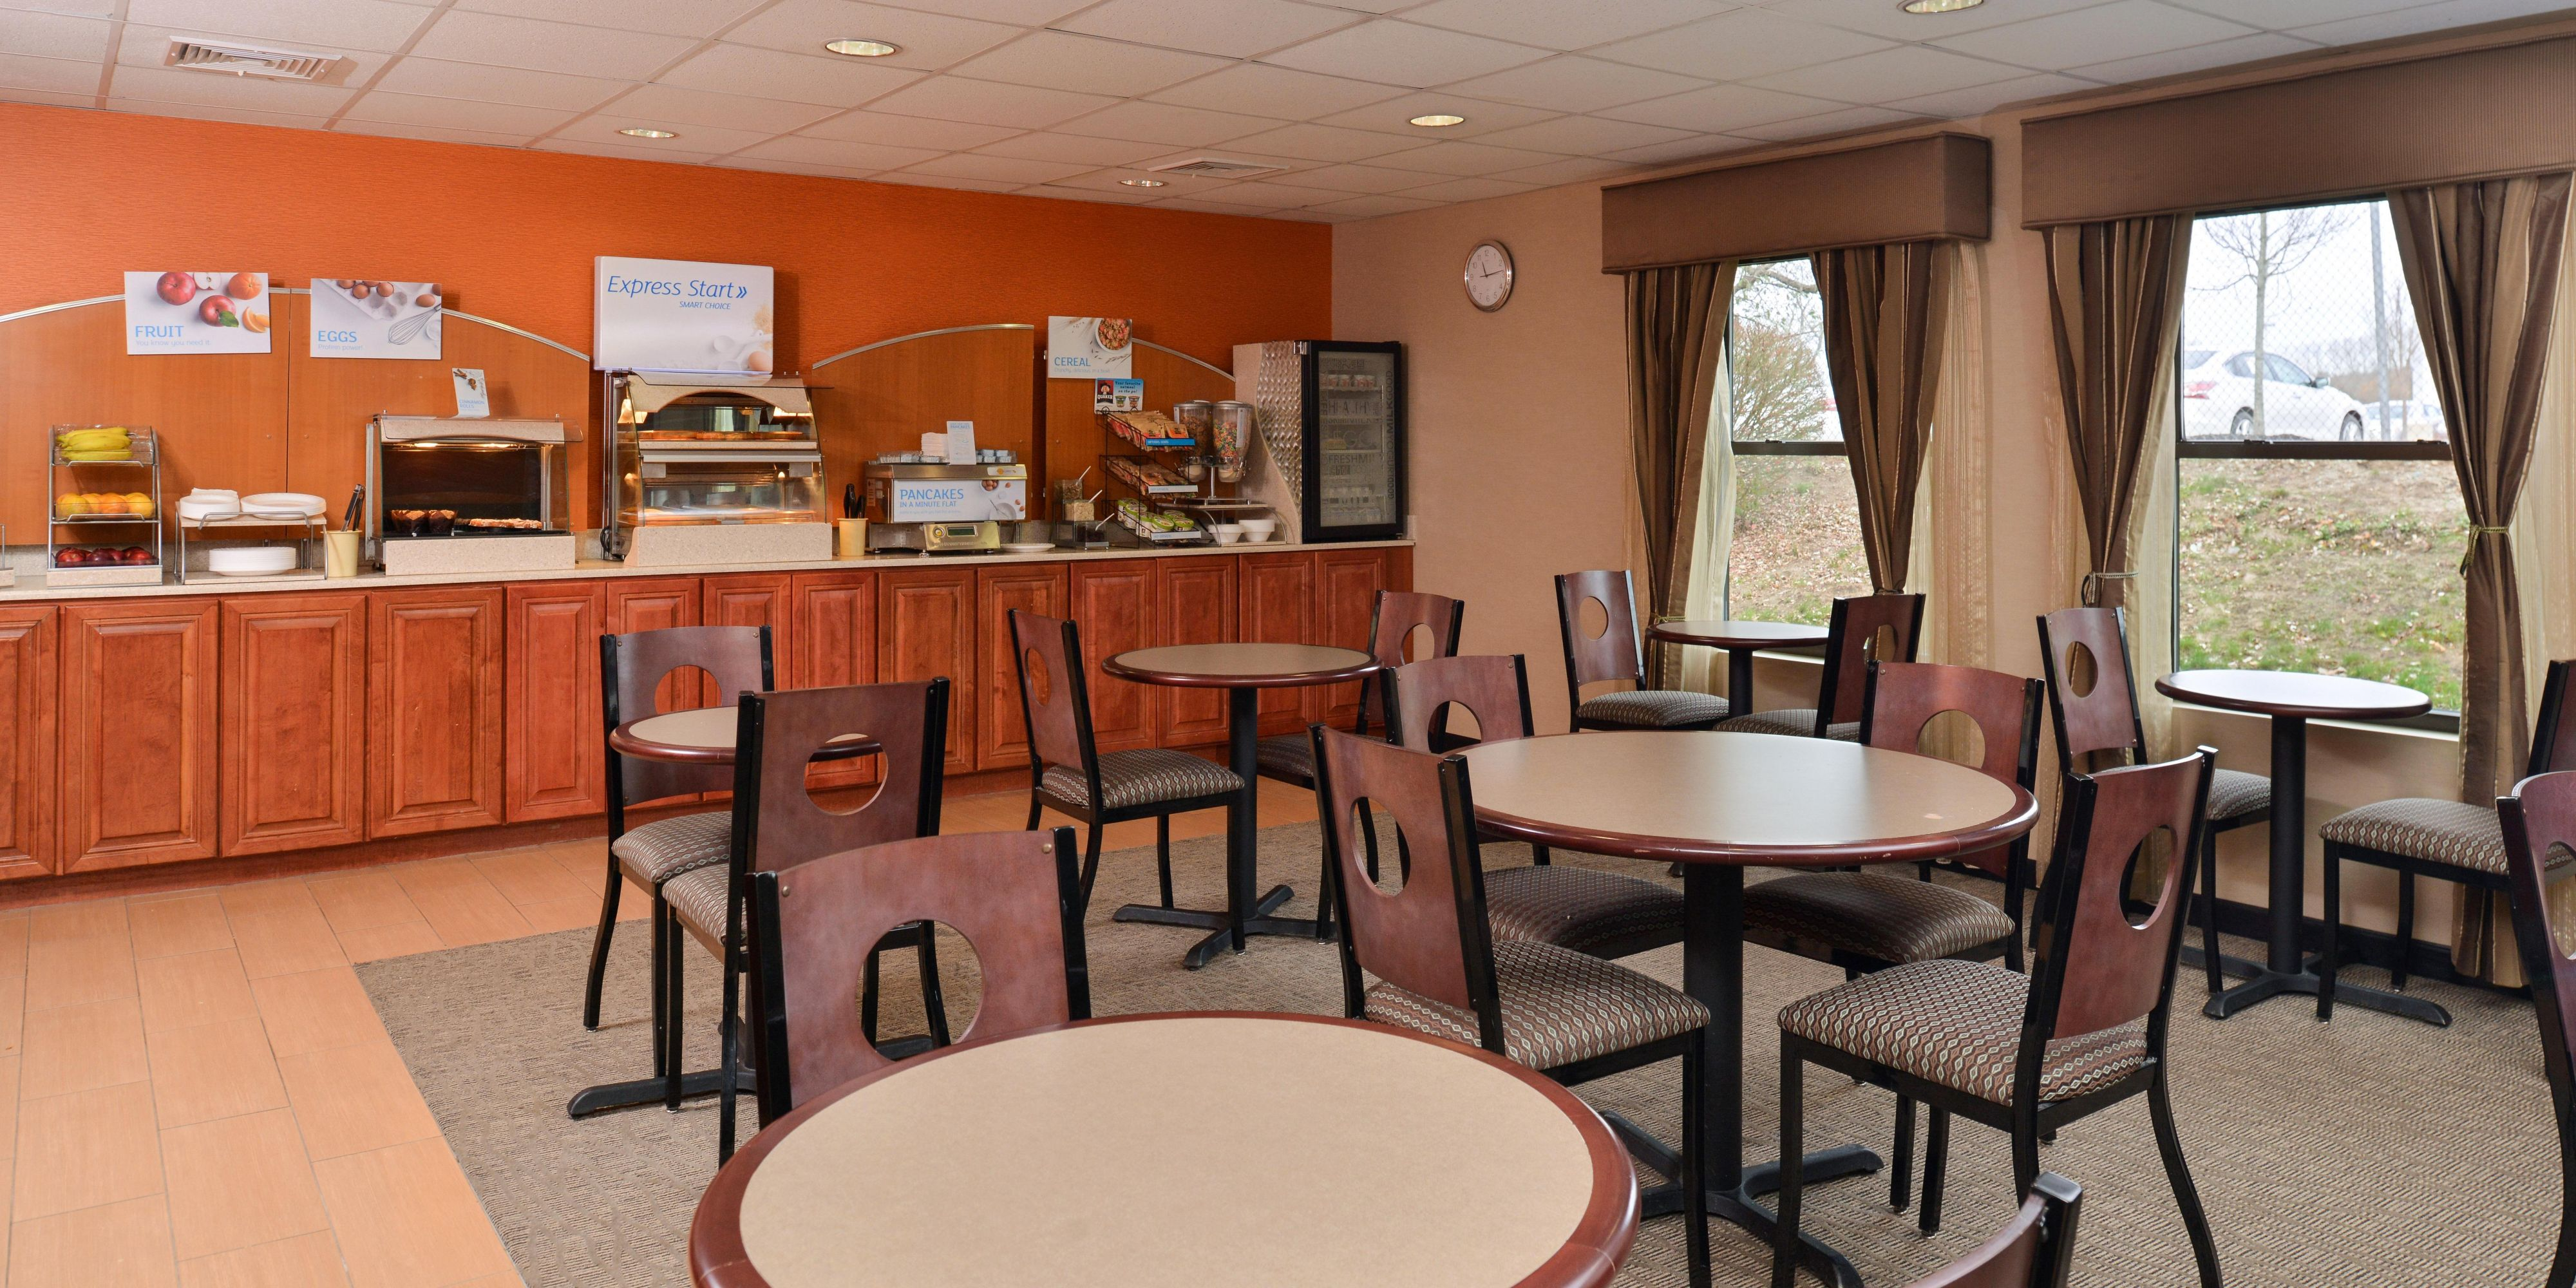 Holiday Inn Express North Attleboro 4289517451 2x1